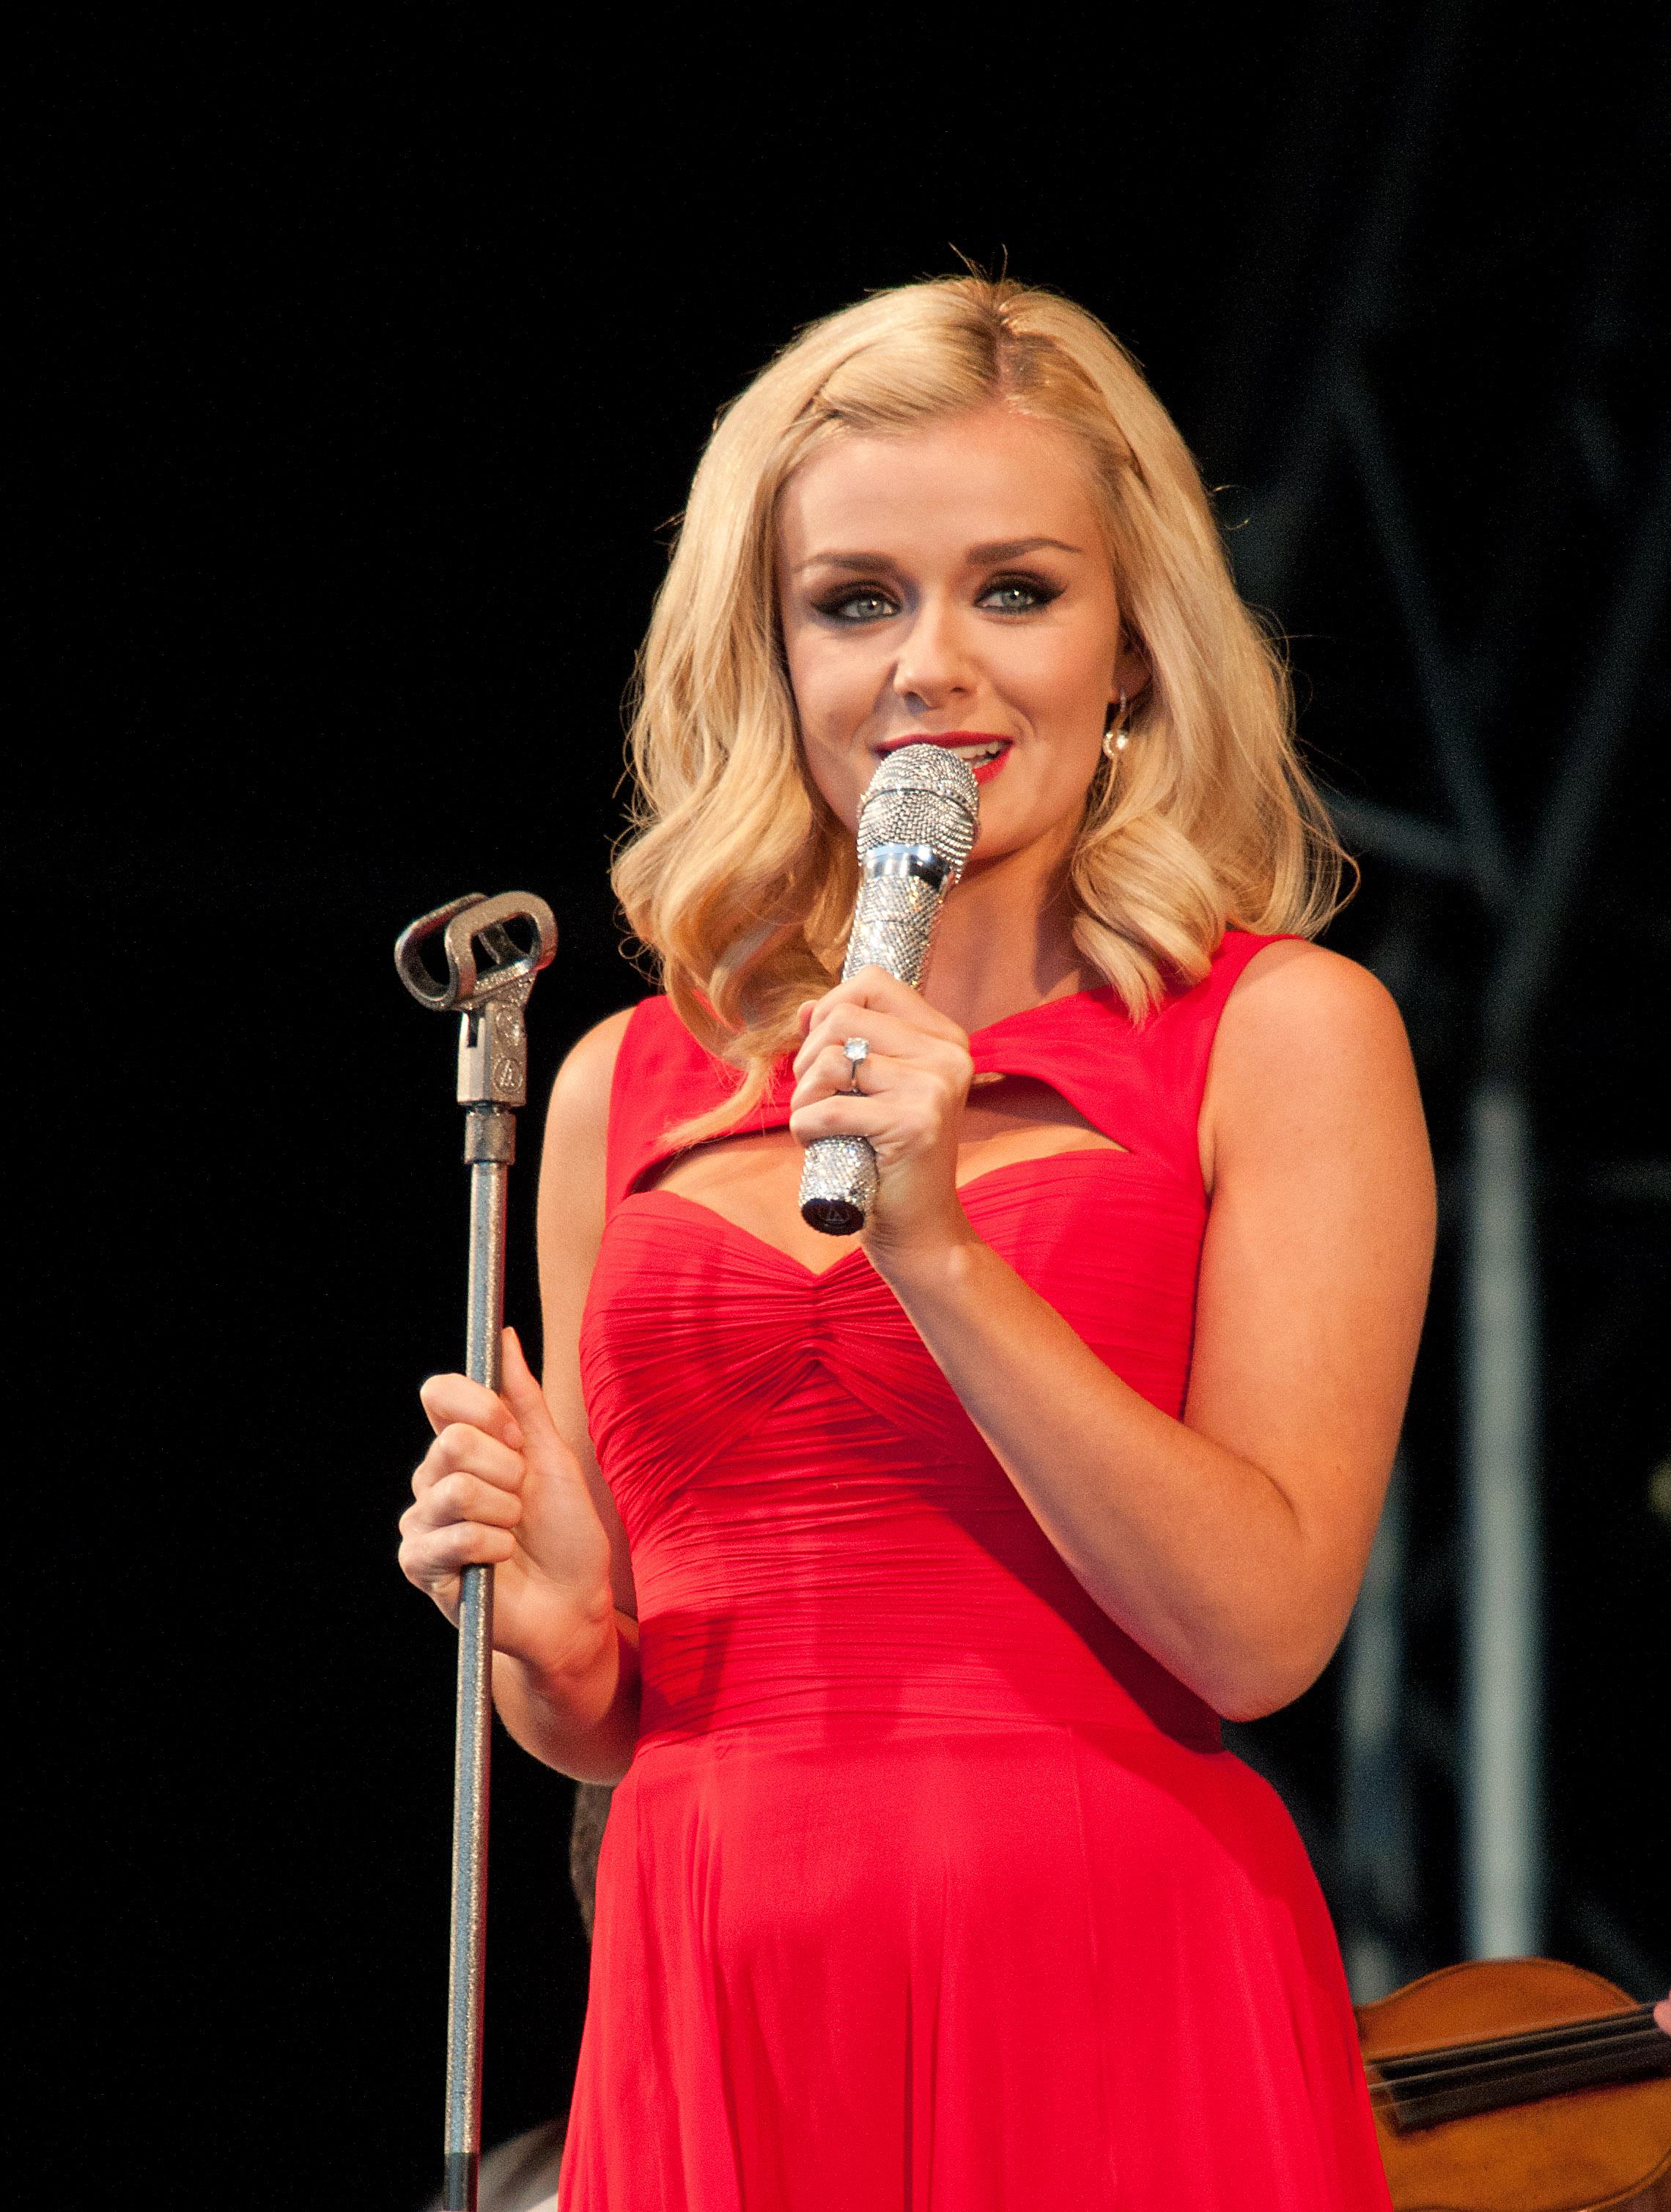 female celebrities welsh singer - photo #28